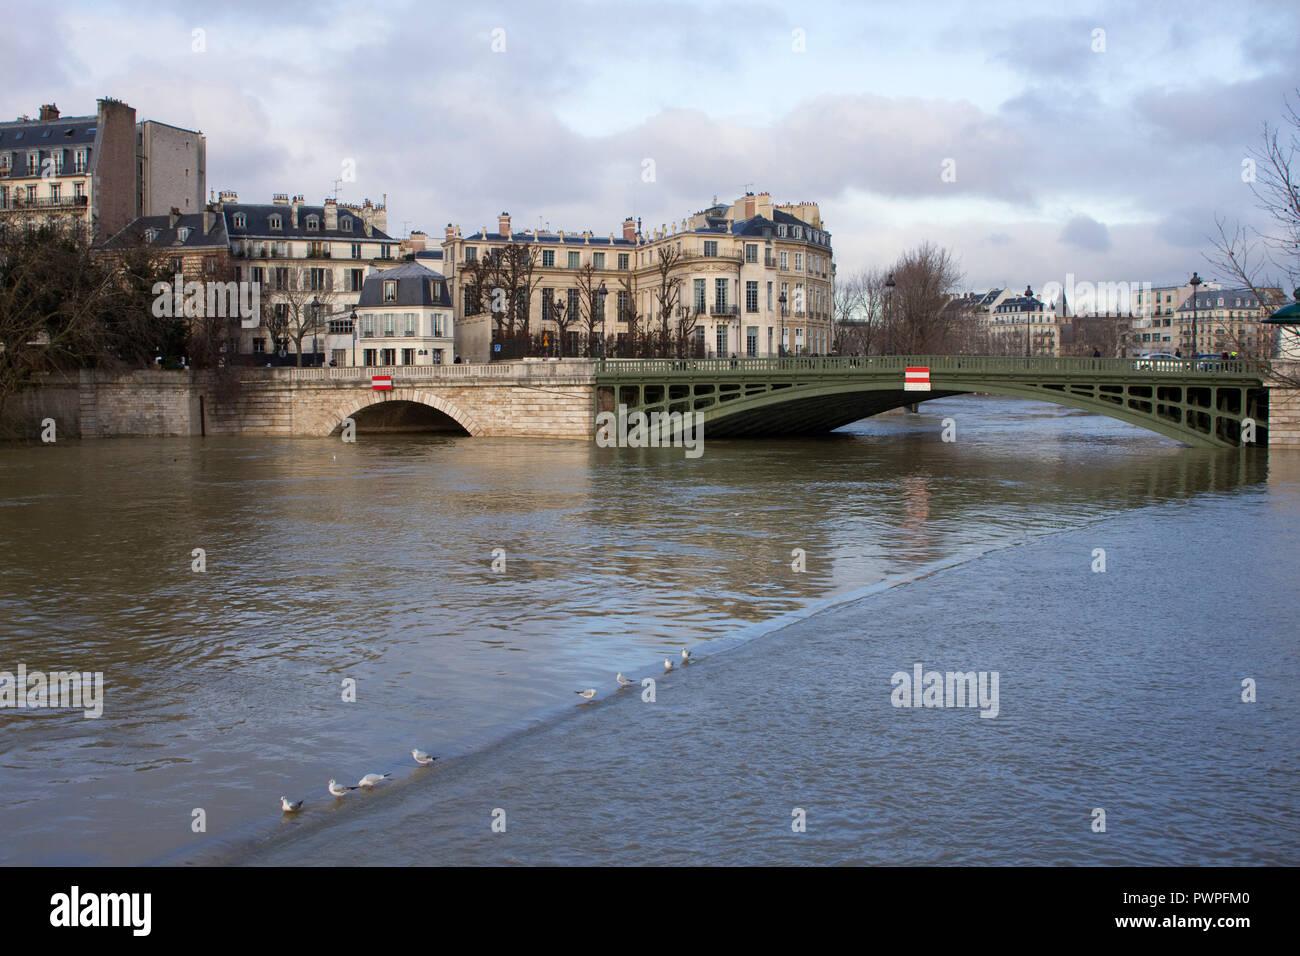 France, Paris, the Seine flooding on 26 January 2018. - Stock Image